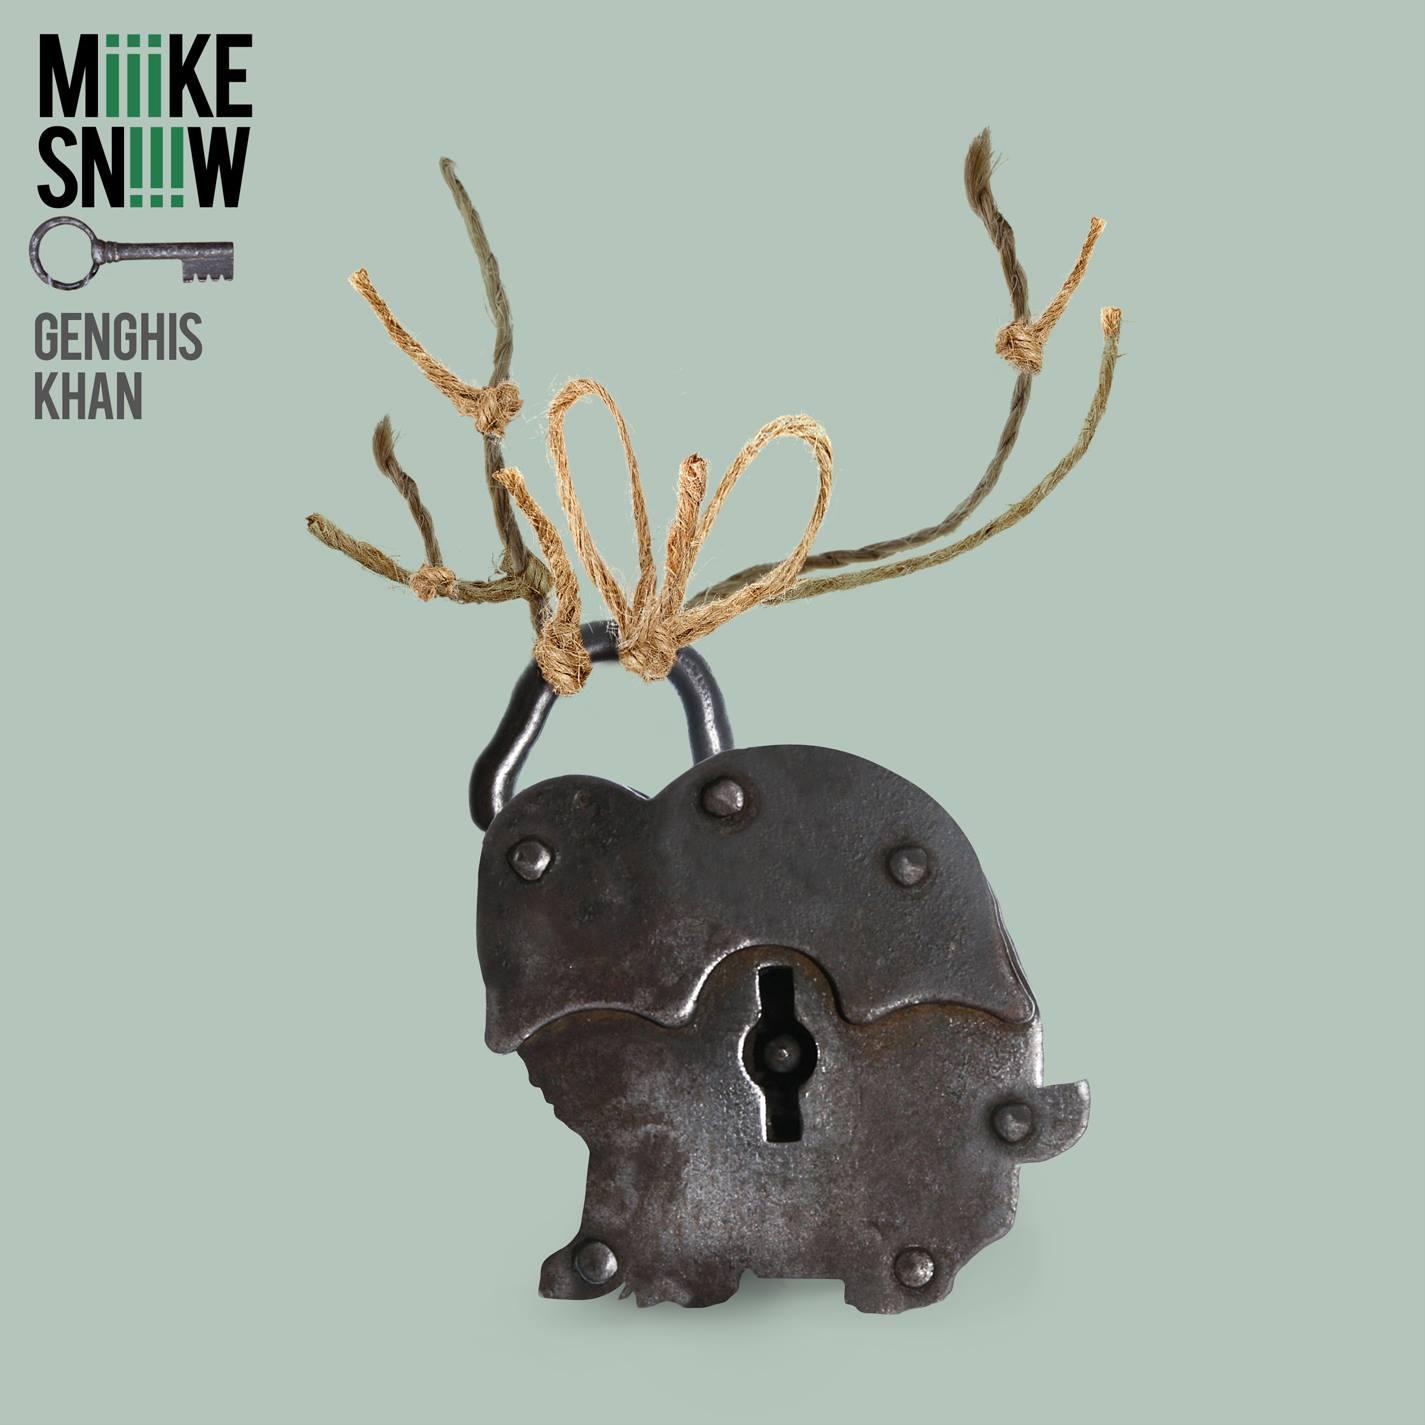 Miike Snow Genghis Khan El Buho Unofficial Remix